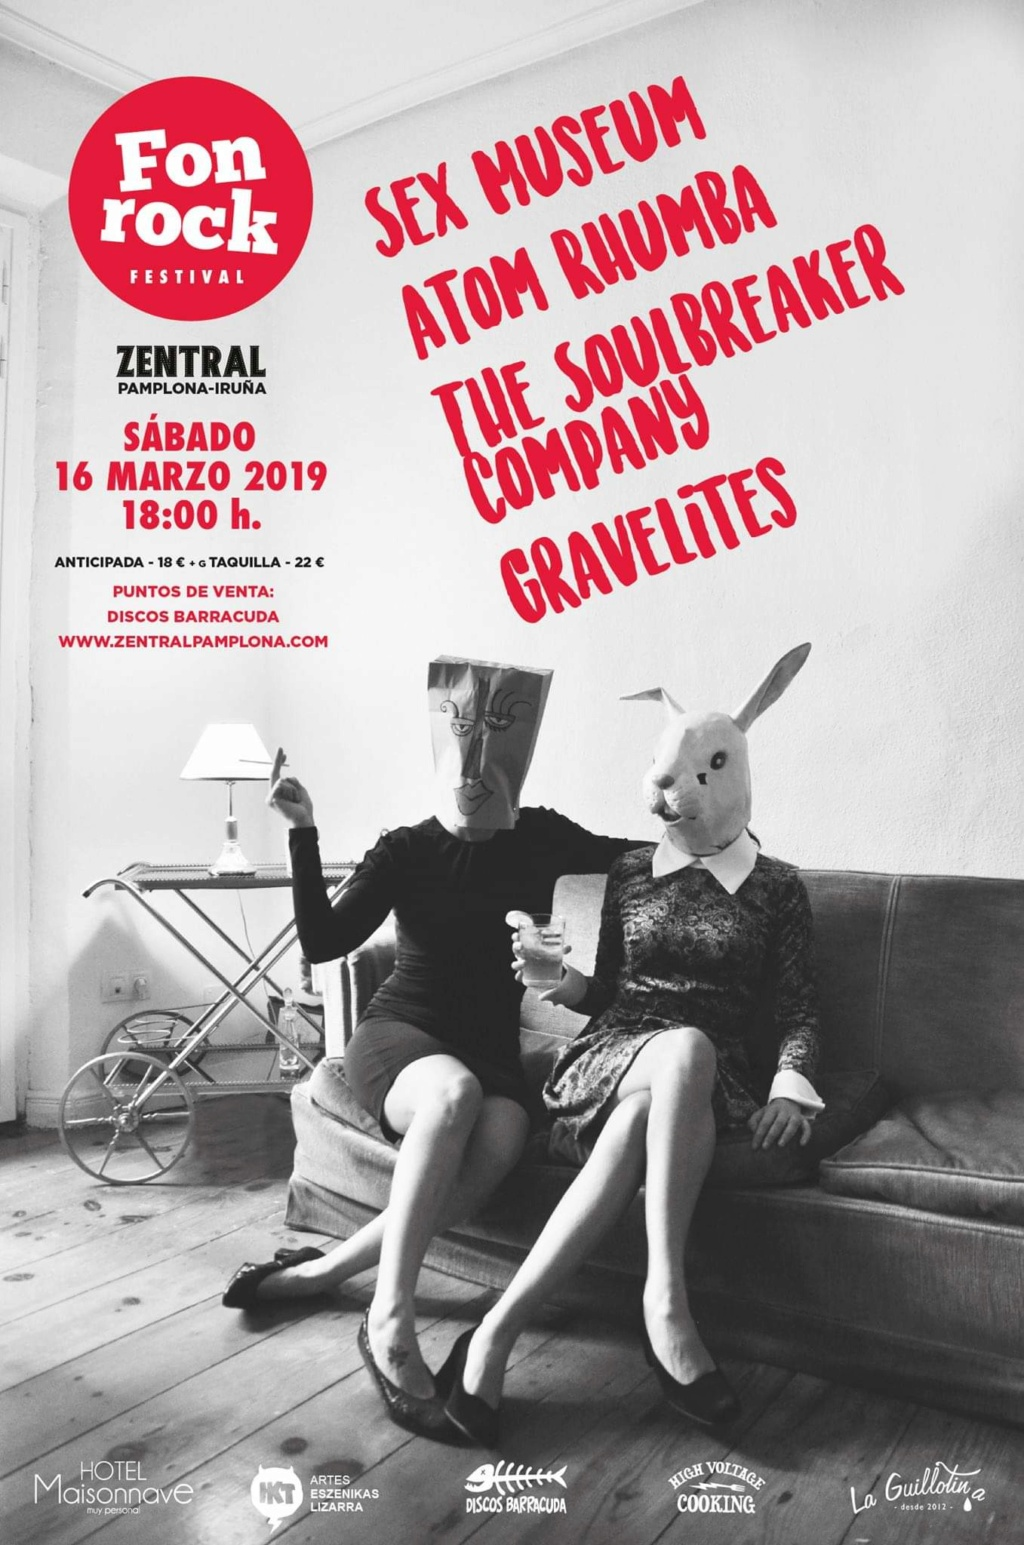 Fonrock 2019: Sex Museum, Atom Rhumba, The Soulbreaker Company & Gravelites. 16 de marzo en Zentral 50280410